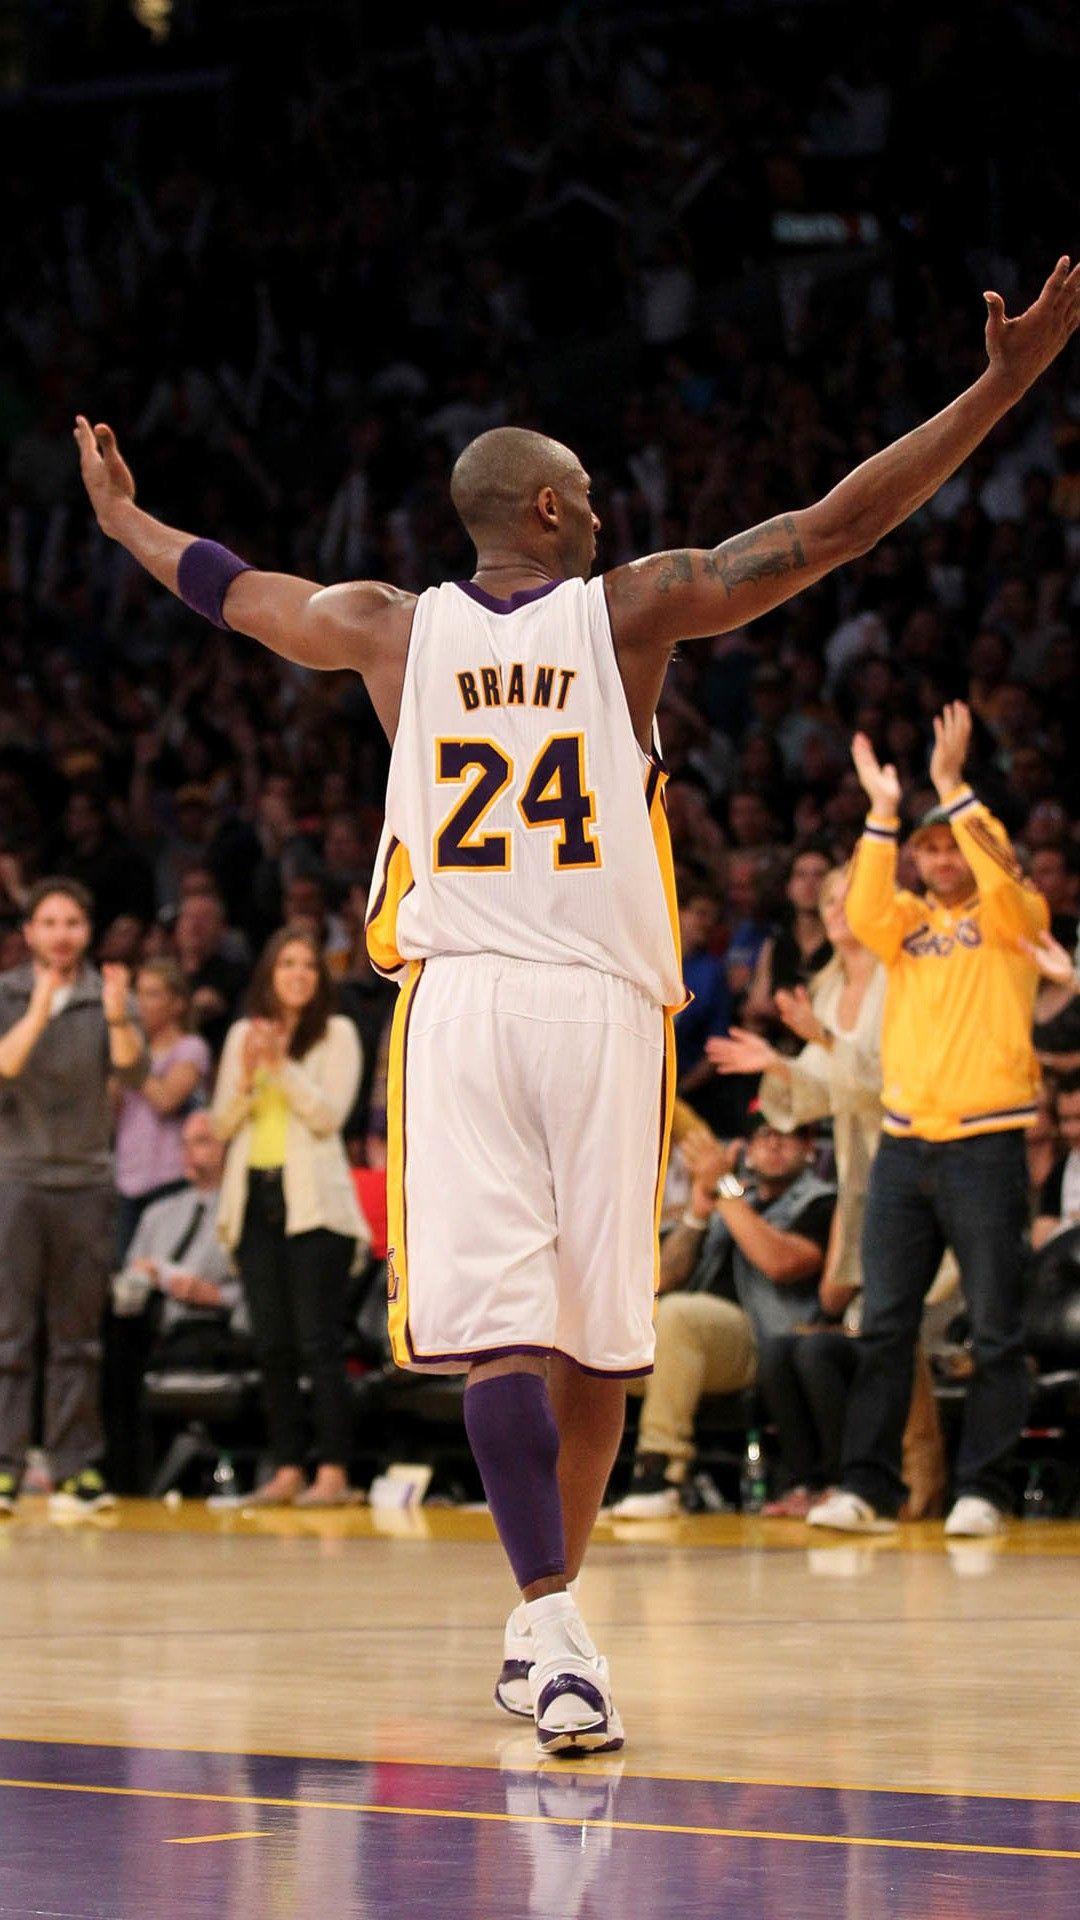 Beautiful Kobe Bryant Live Wallpaper Iphone Kobe Bryant Wallpaper Kobe Bryant Kobe Bryant Black Mamba